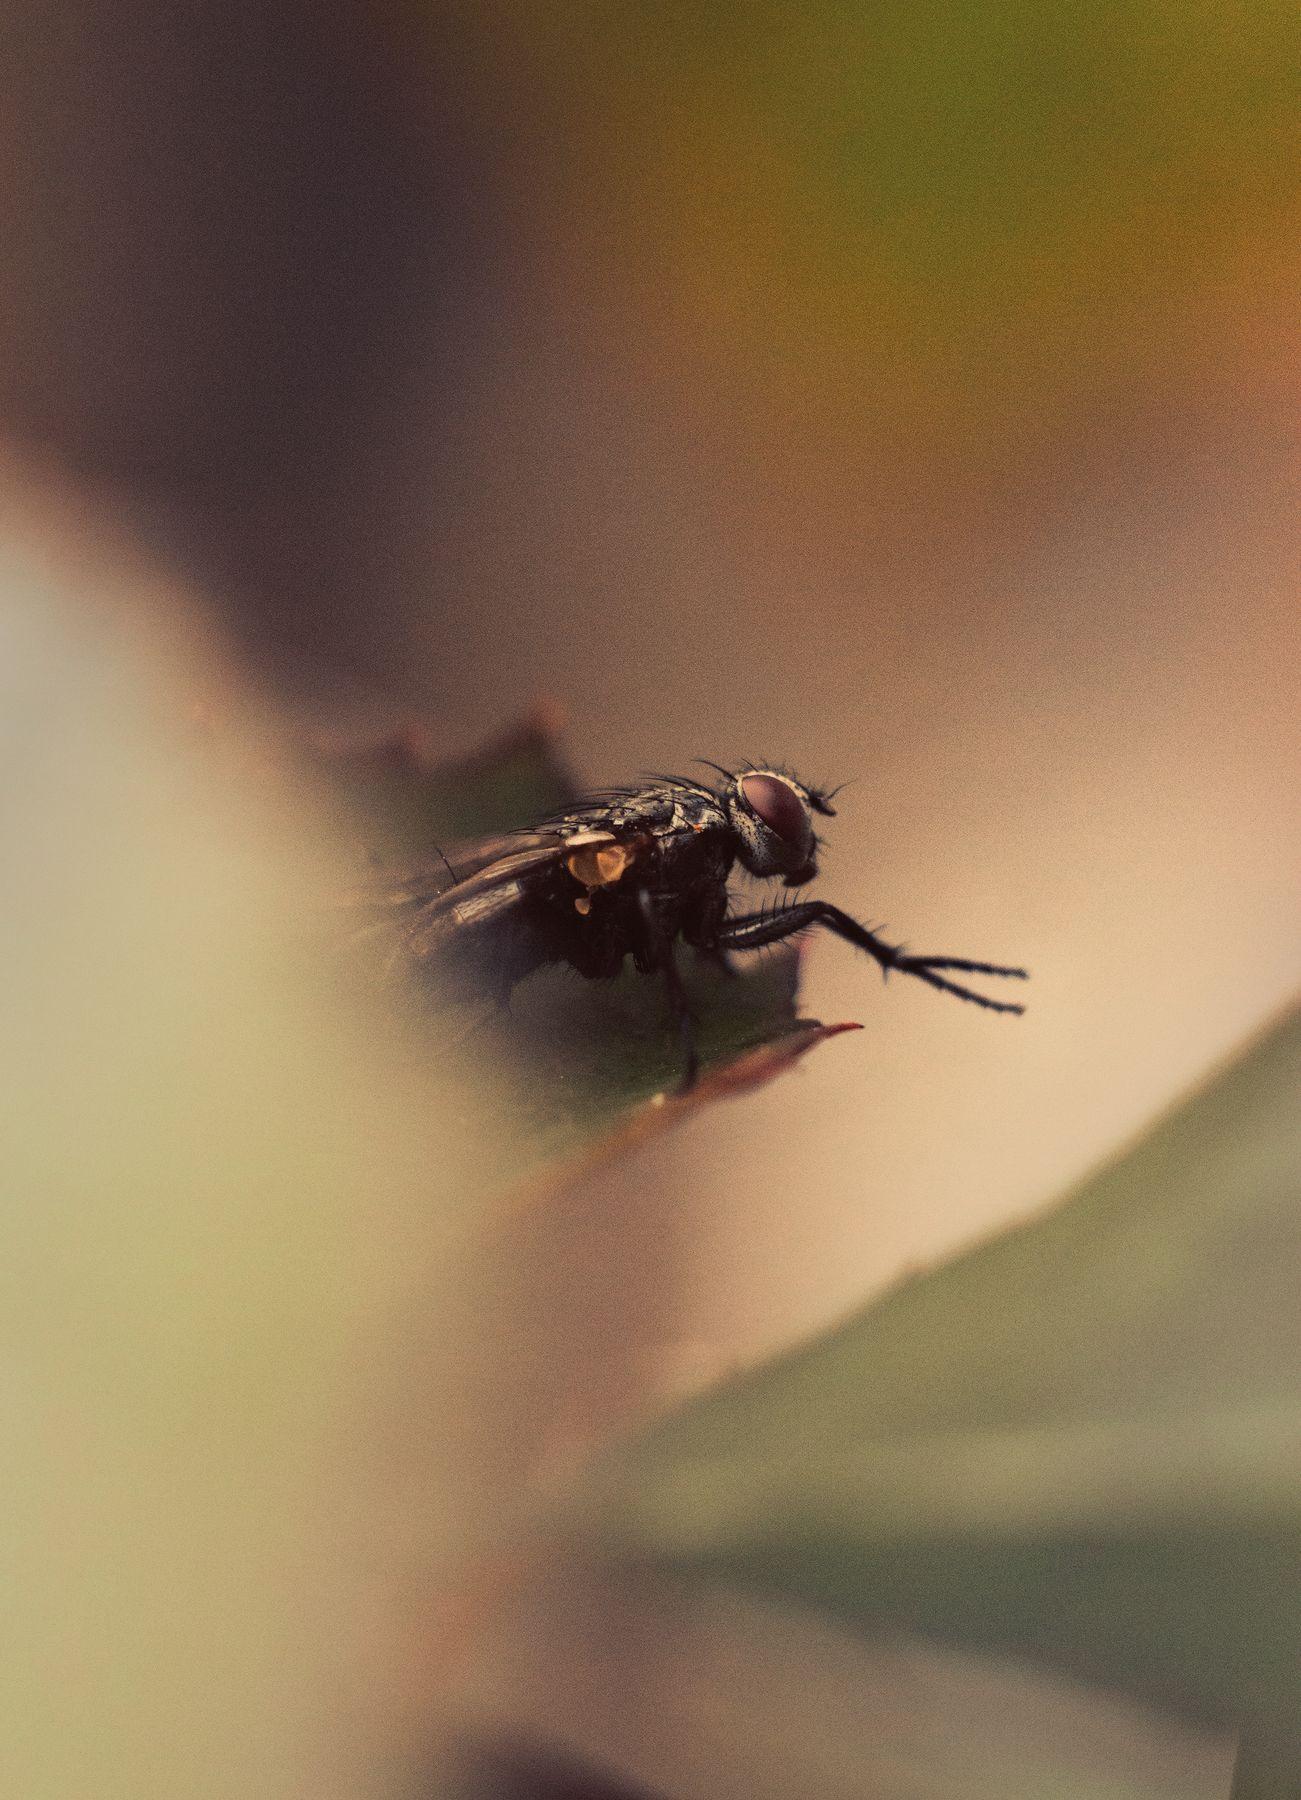 Fly fly insect outdoor brown oragne green yellow beige black sitting plant eyes legs wings муха лапки зелень растение жёлтый коричневый крылья насекомое сидит